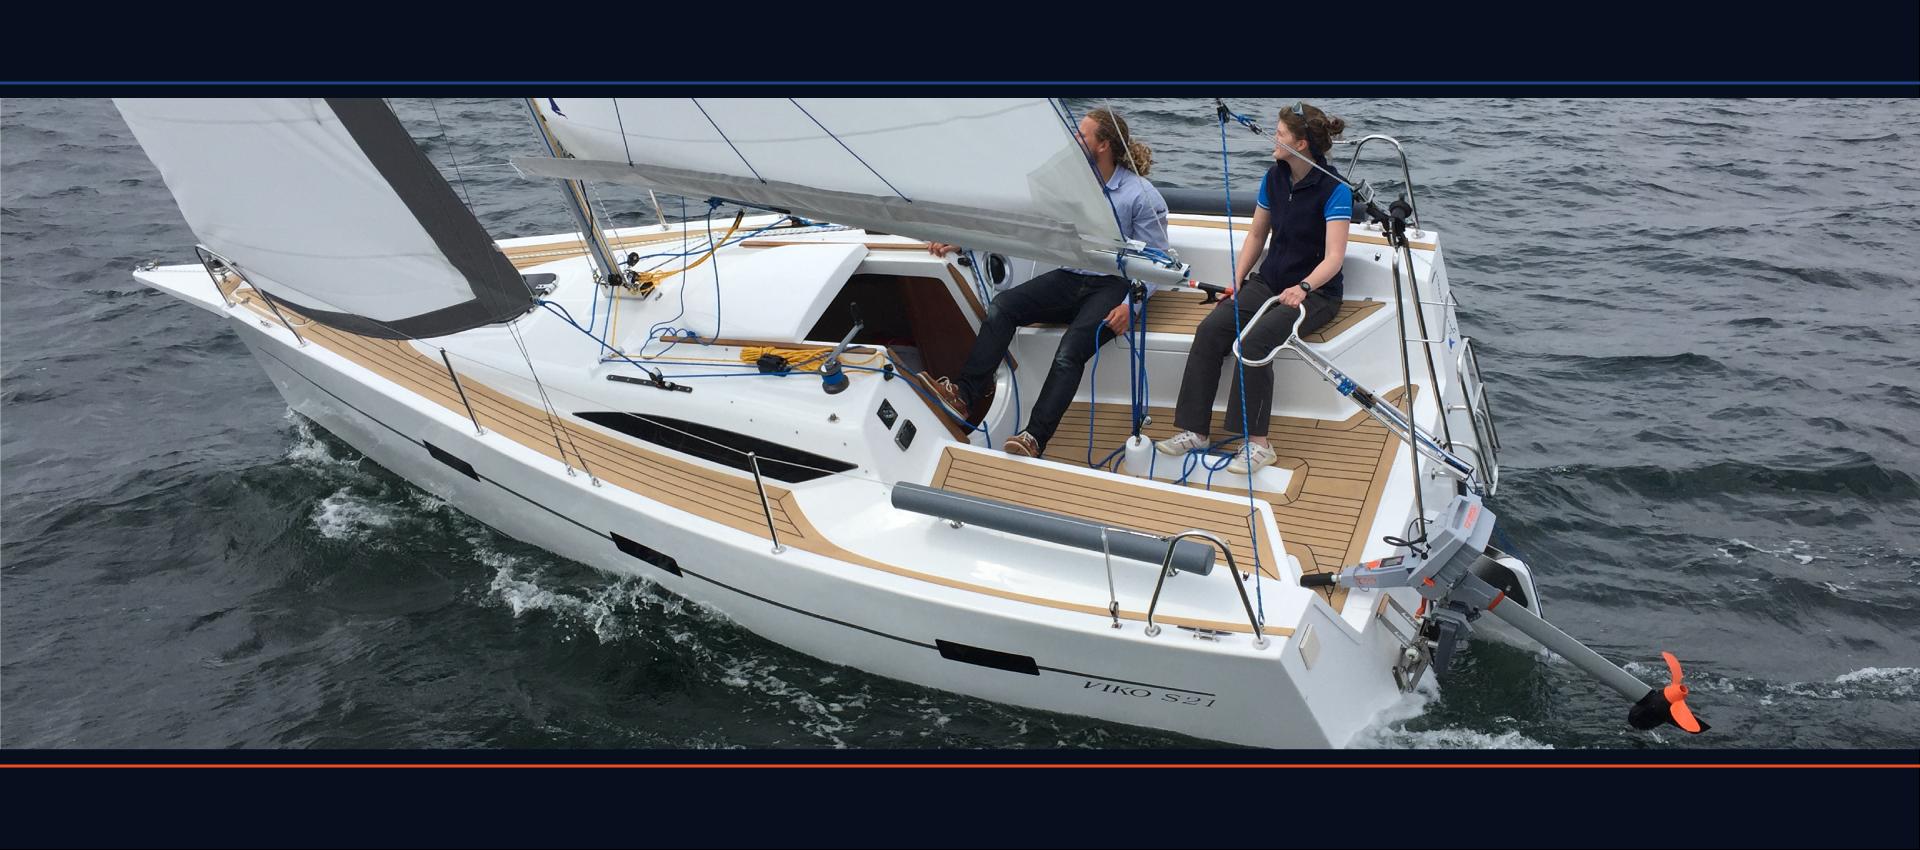 Viko yachts-VikoS-21-seilbåt